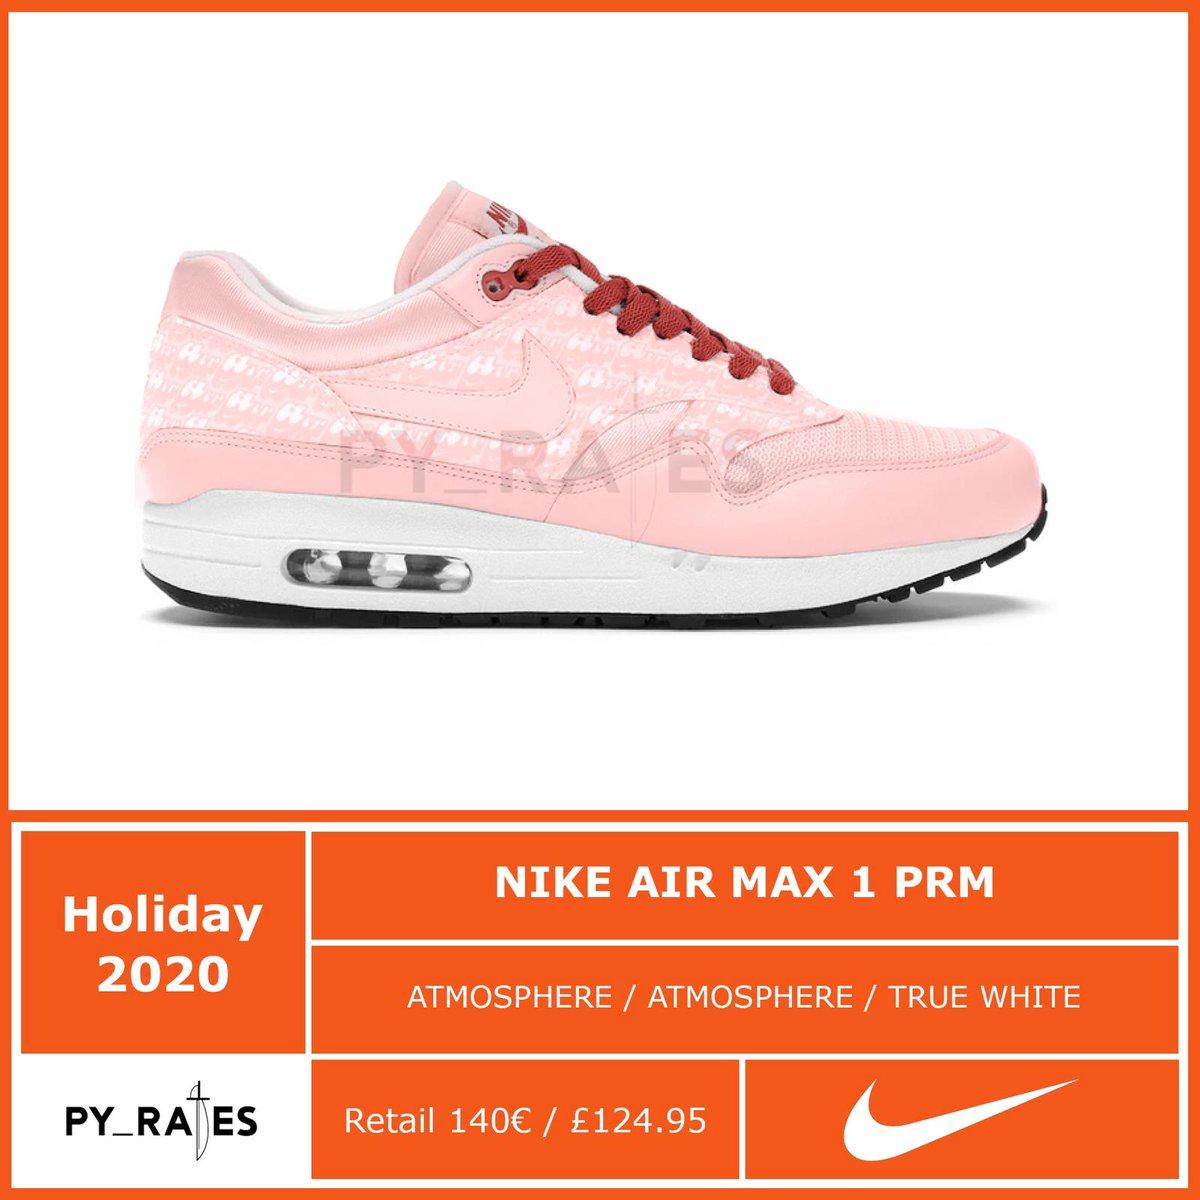 Nike Air Max 1 Powerwall Pink Lemonade Release Date Info